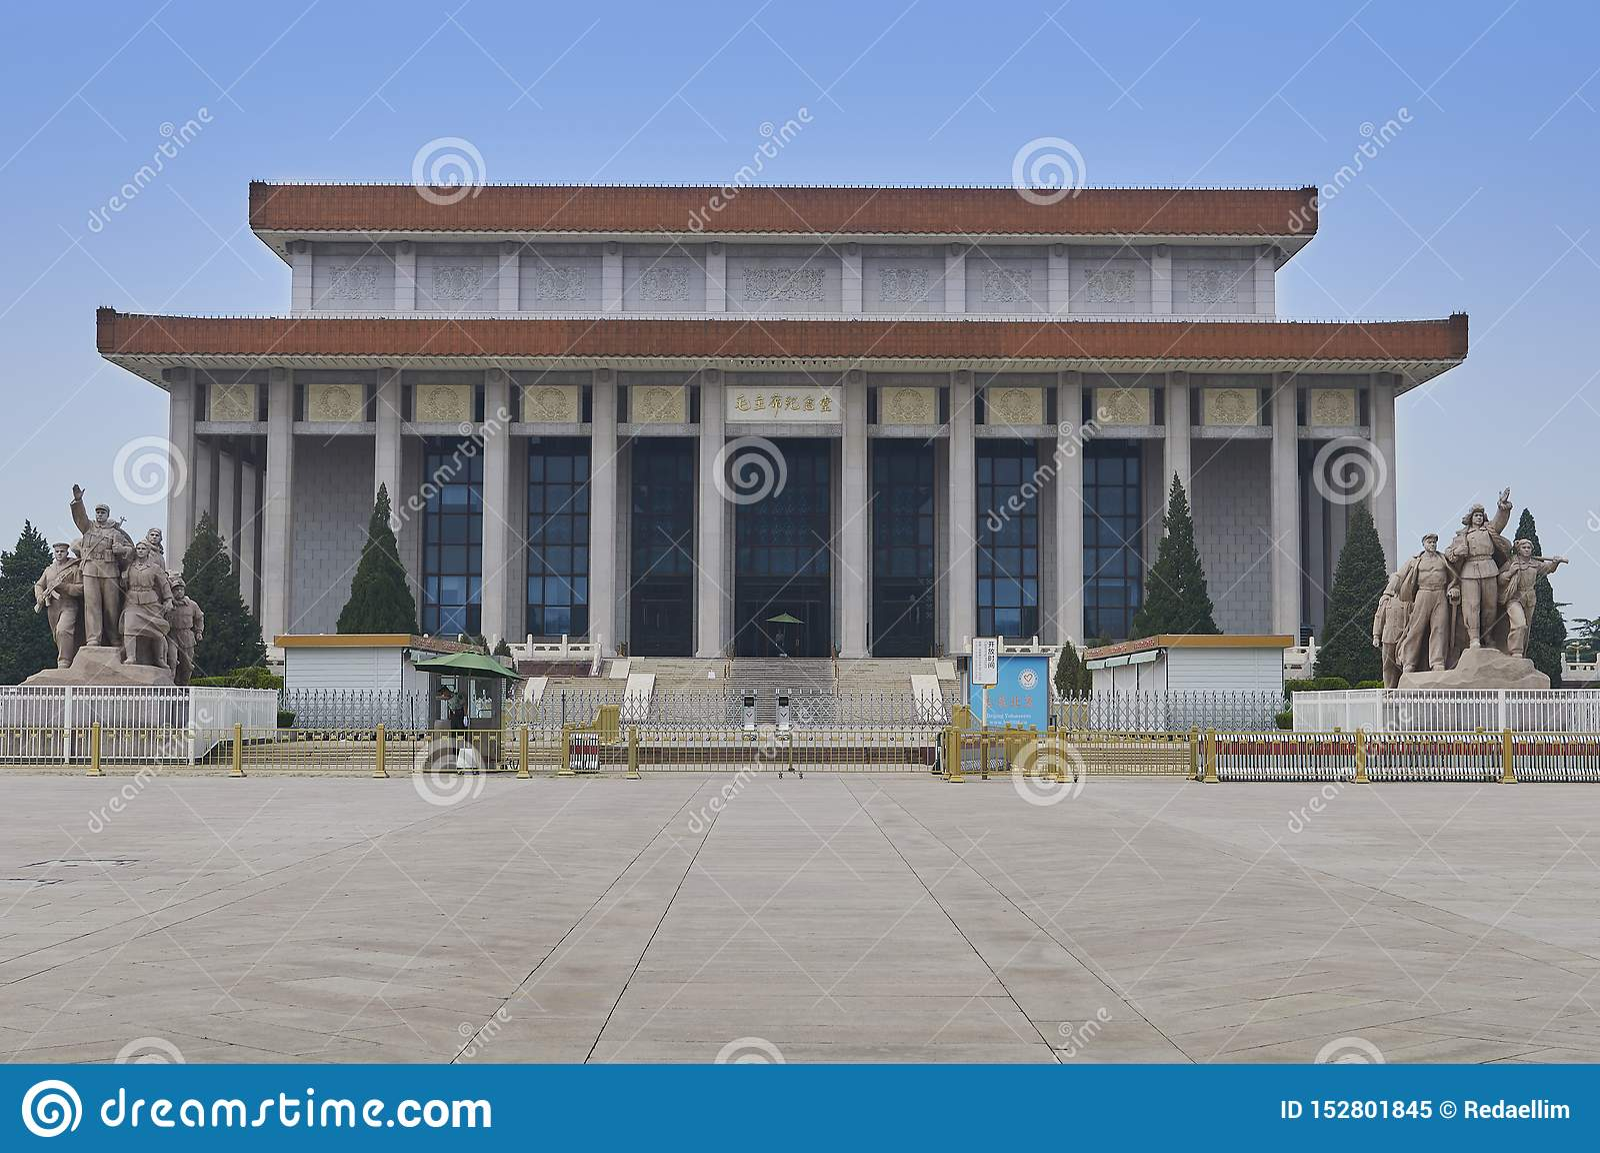 Peking, China - Juni 2019: Mausoleum von Mao Zedong